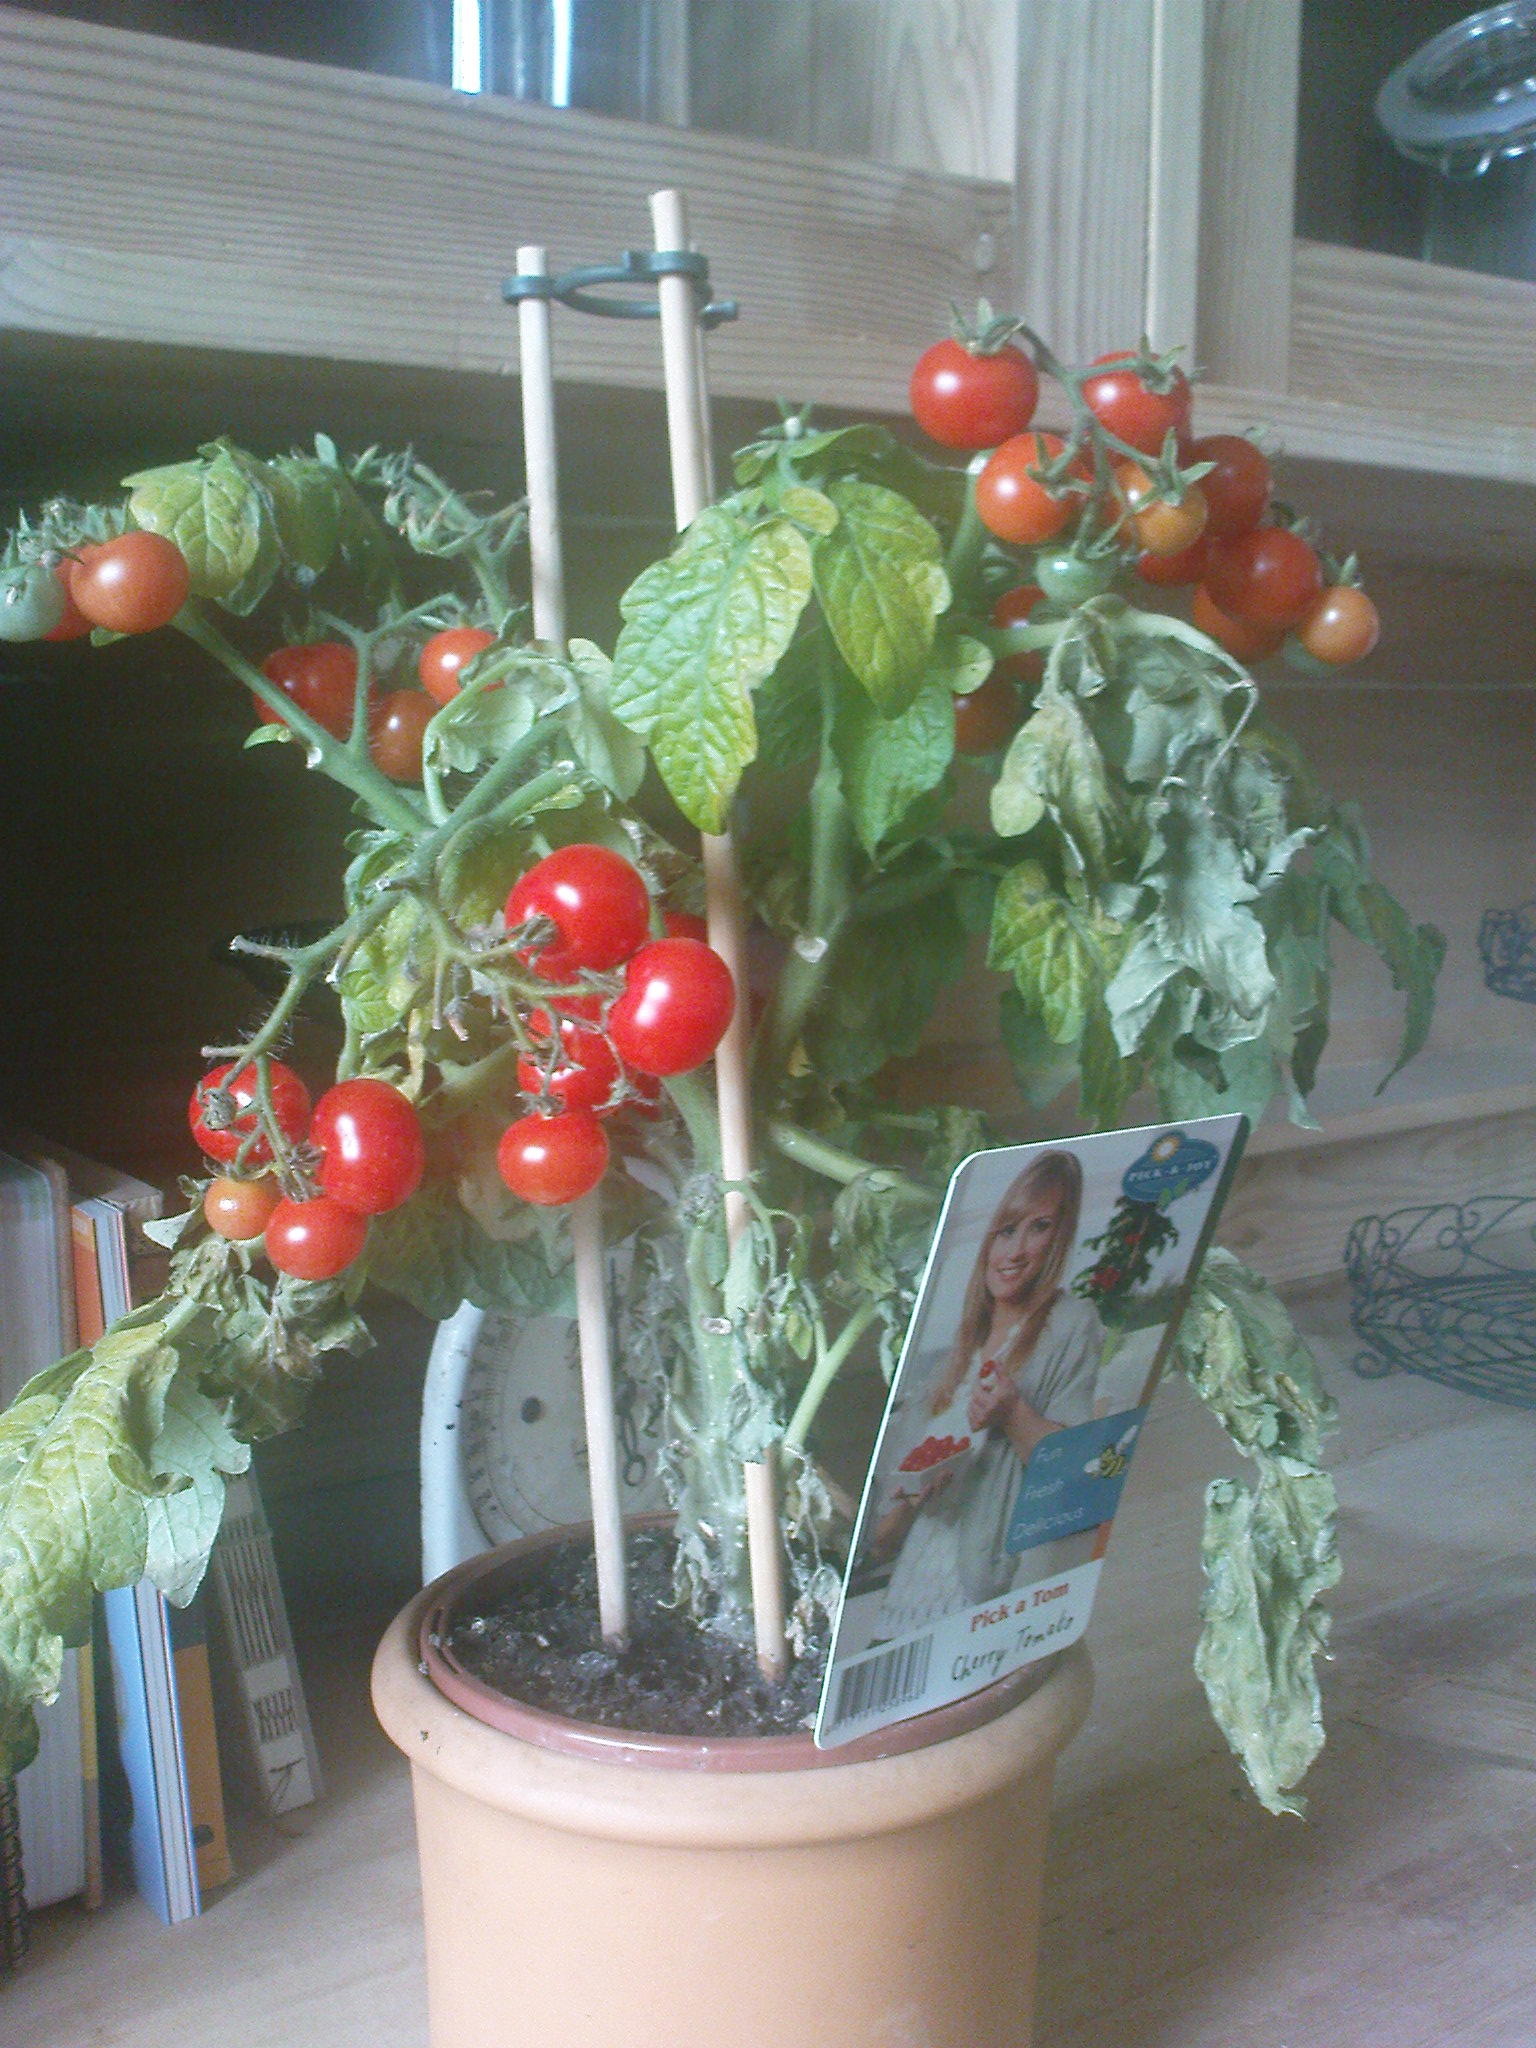 cherrytomate im topf bekommt welke bl tter warum pflanzen pflanzenpflege balkon. Black Bedroom Furniture Sets. Home Design Ideas